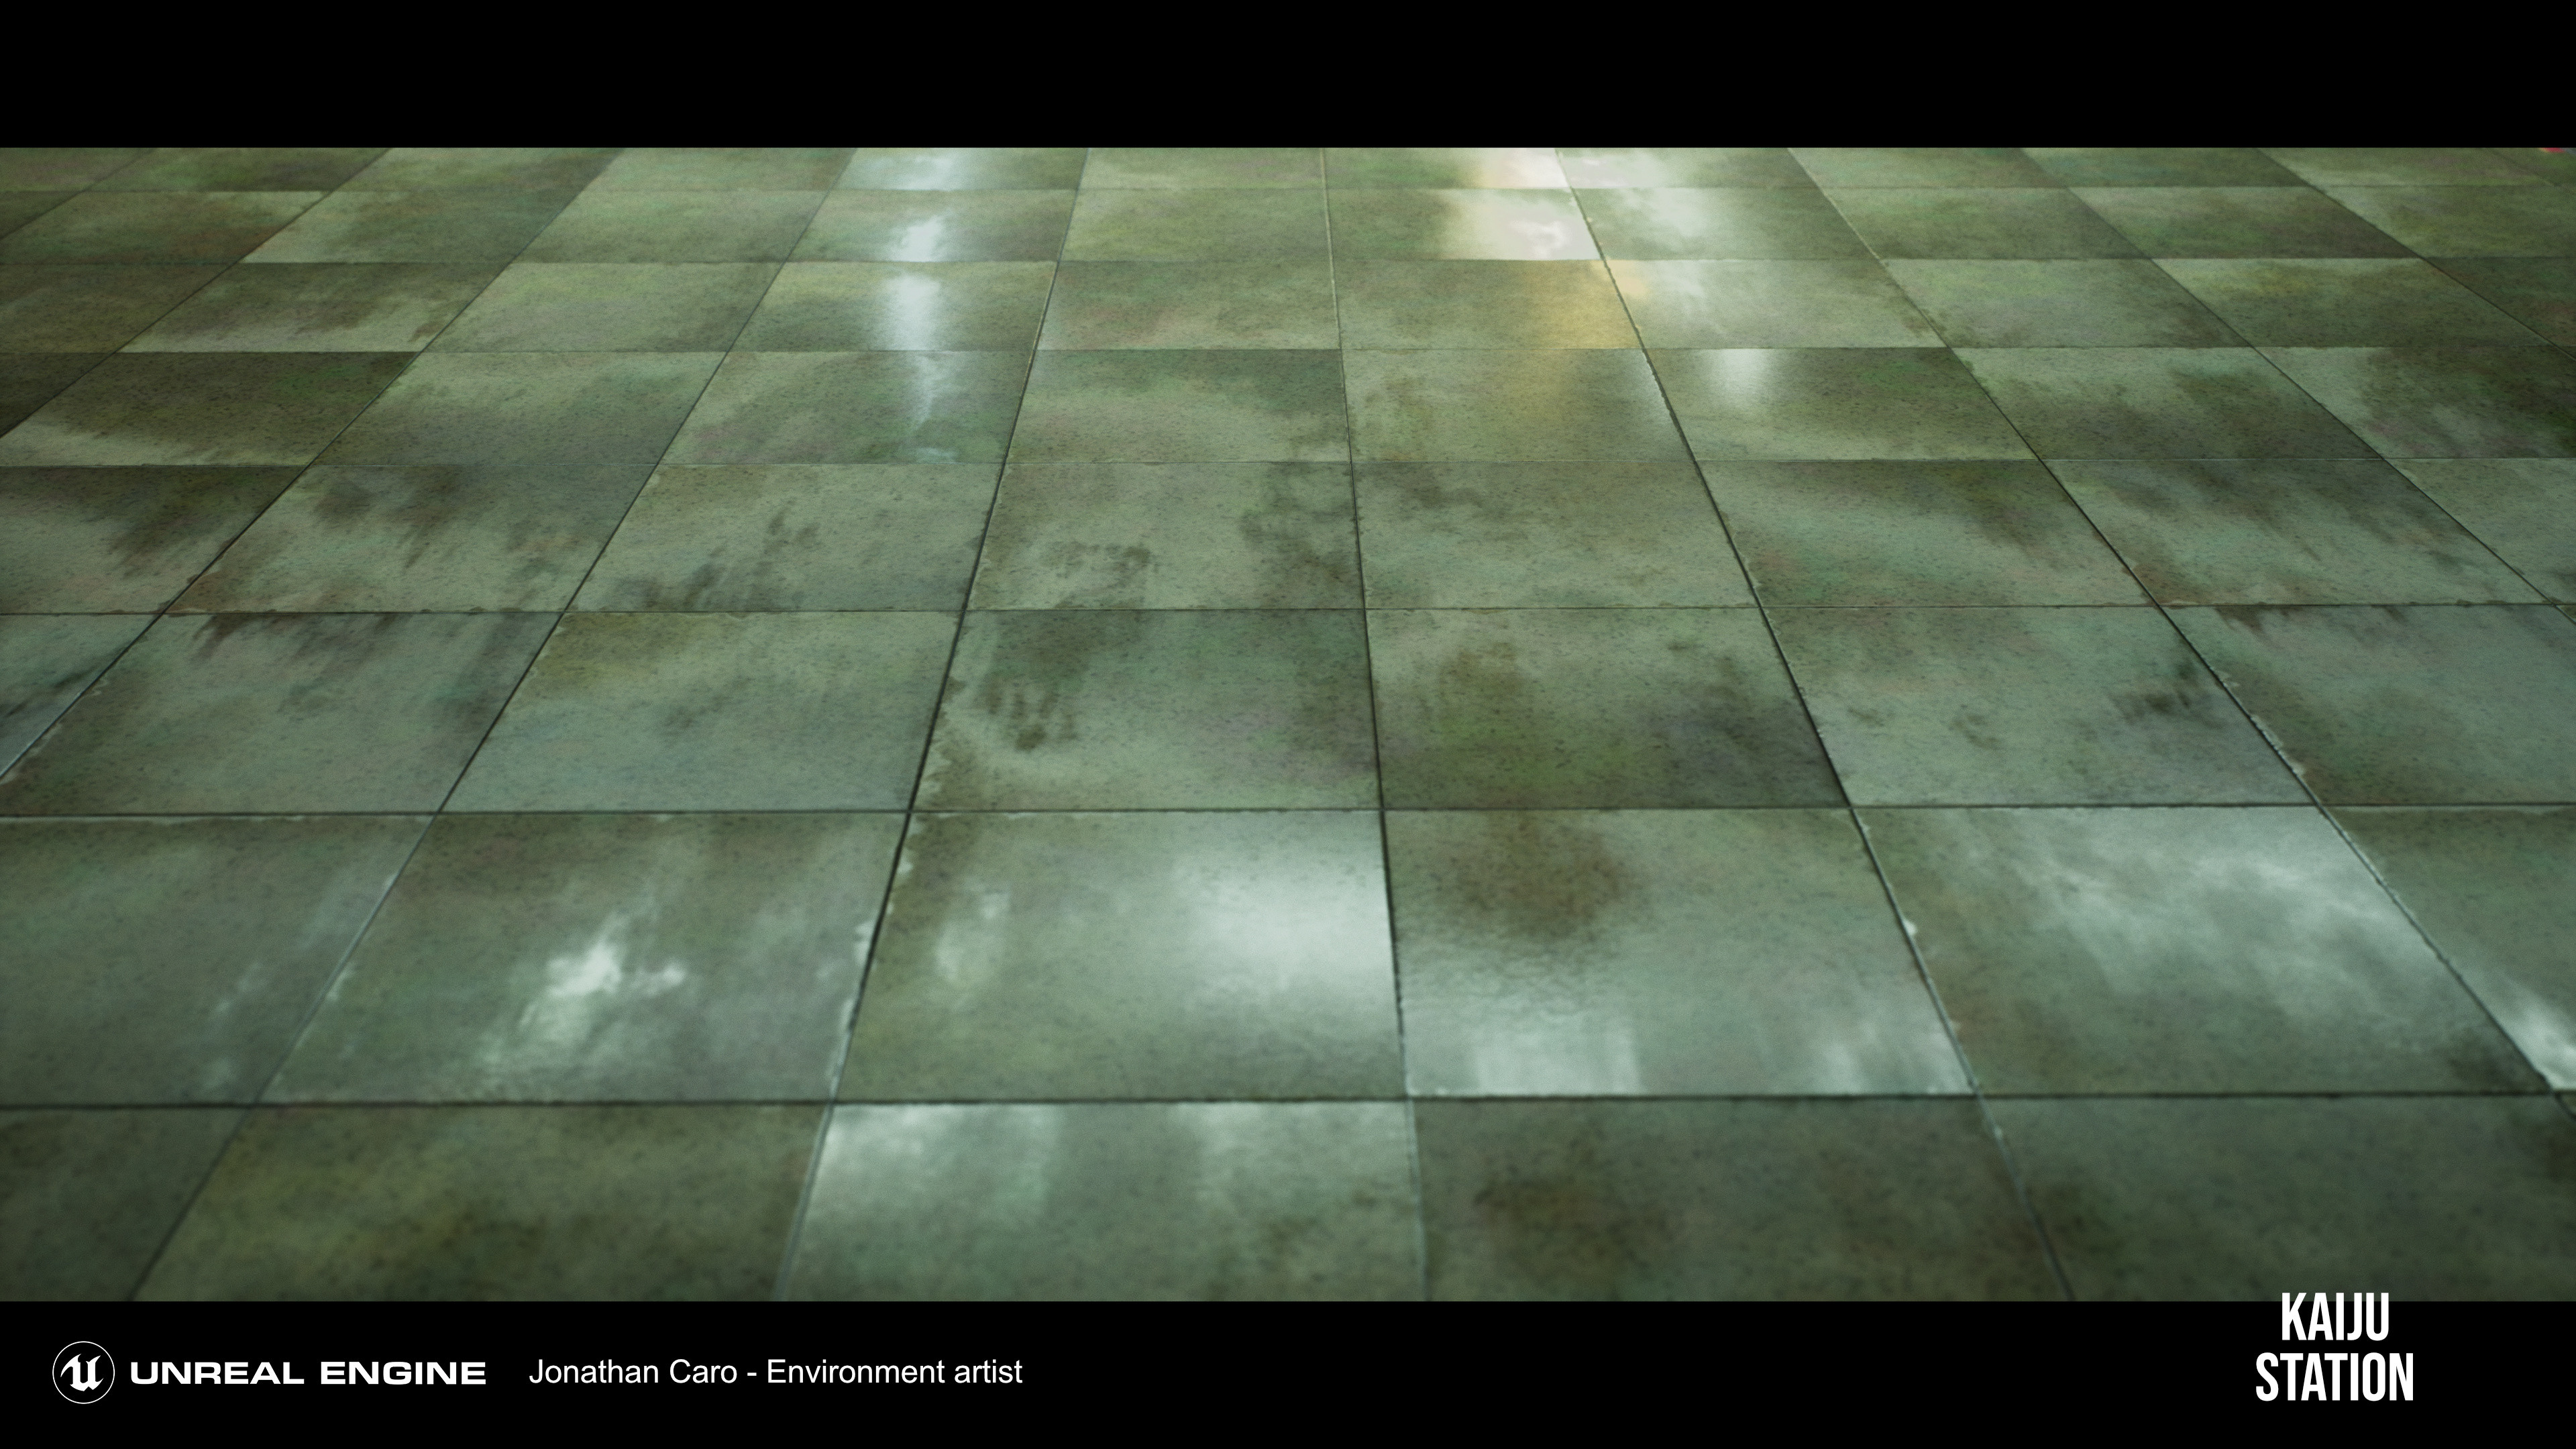 platform ground tiles created with substance designer